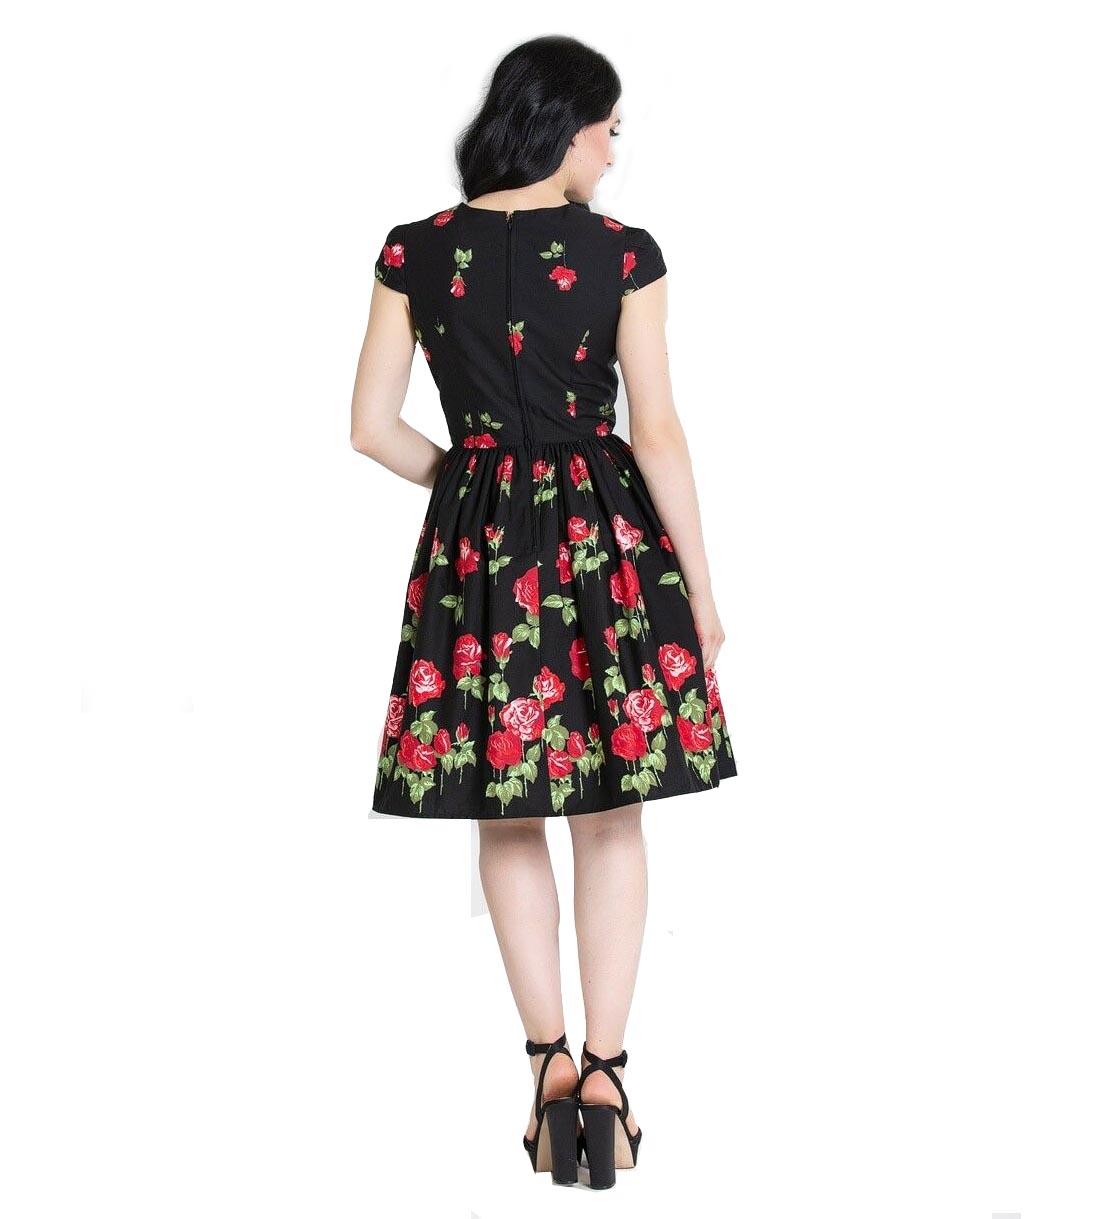 Hell-Bunny-Pin-Up-Mid-Length-50s-Dress-ANTONIA-Rose-Floral-Black thumbnail 25